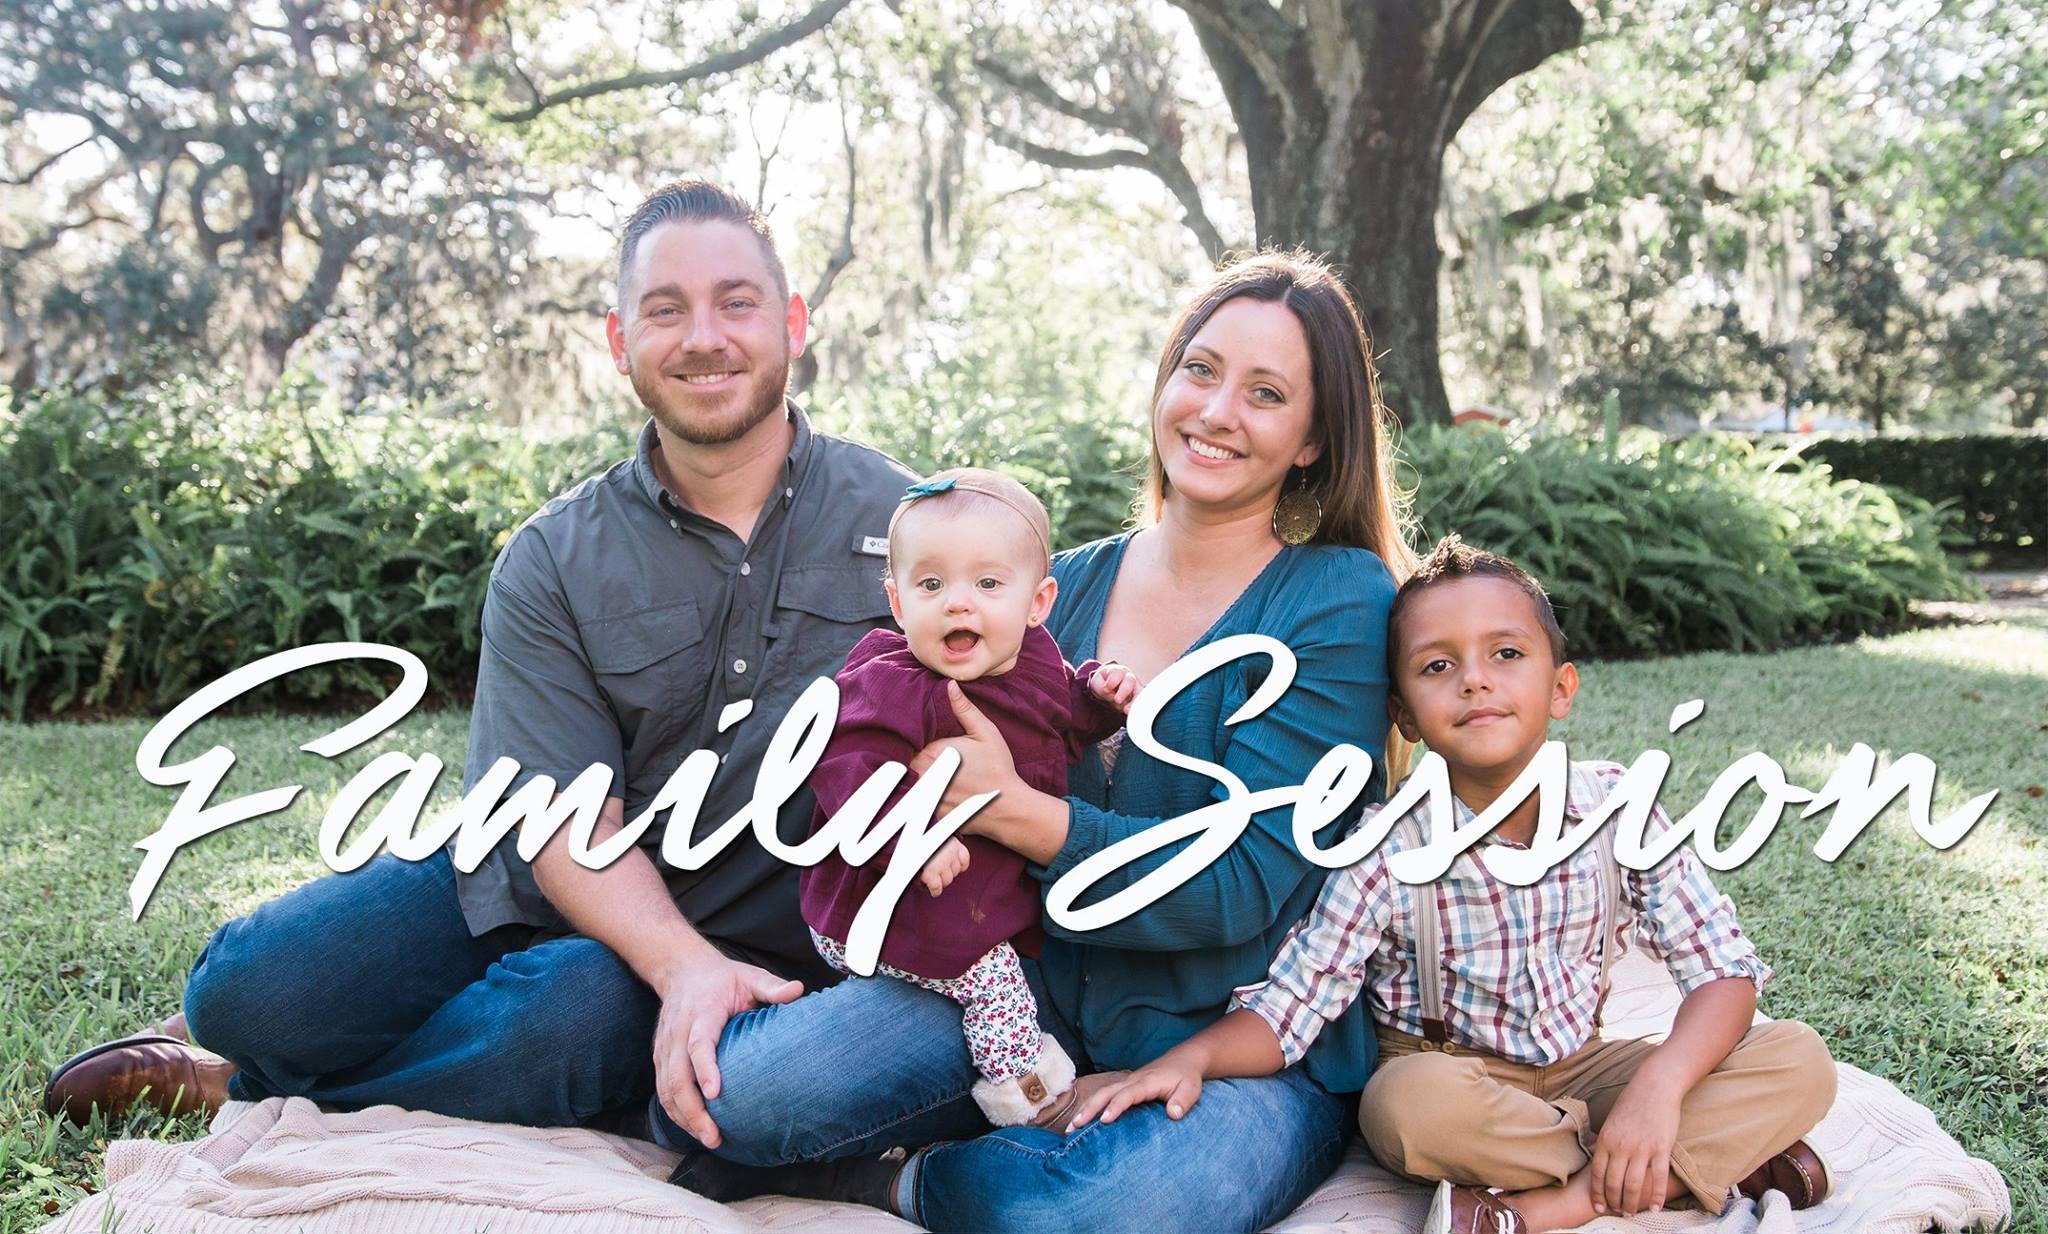 Seminole-heights-garden-club-family-photo, Tampa-photographer